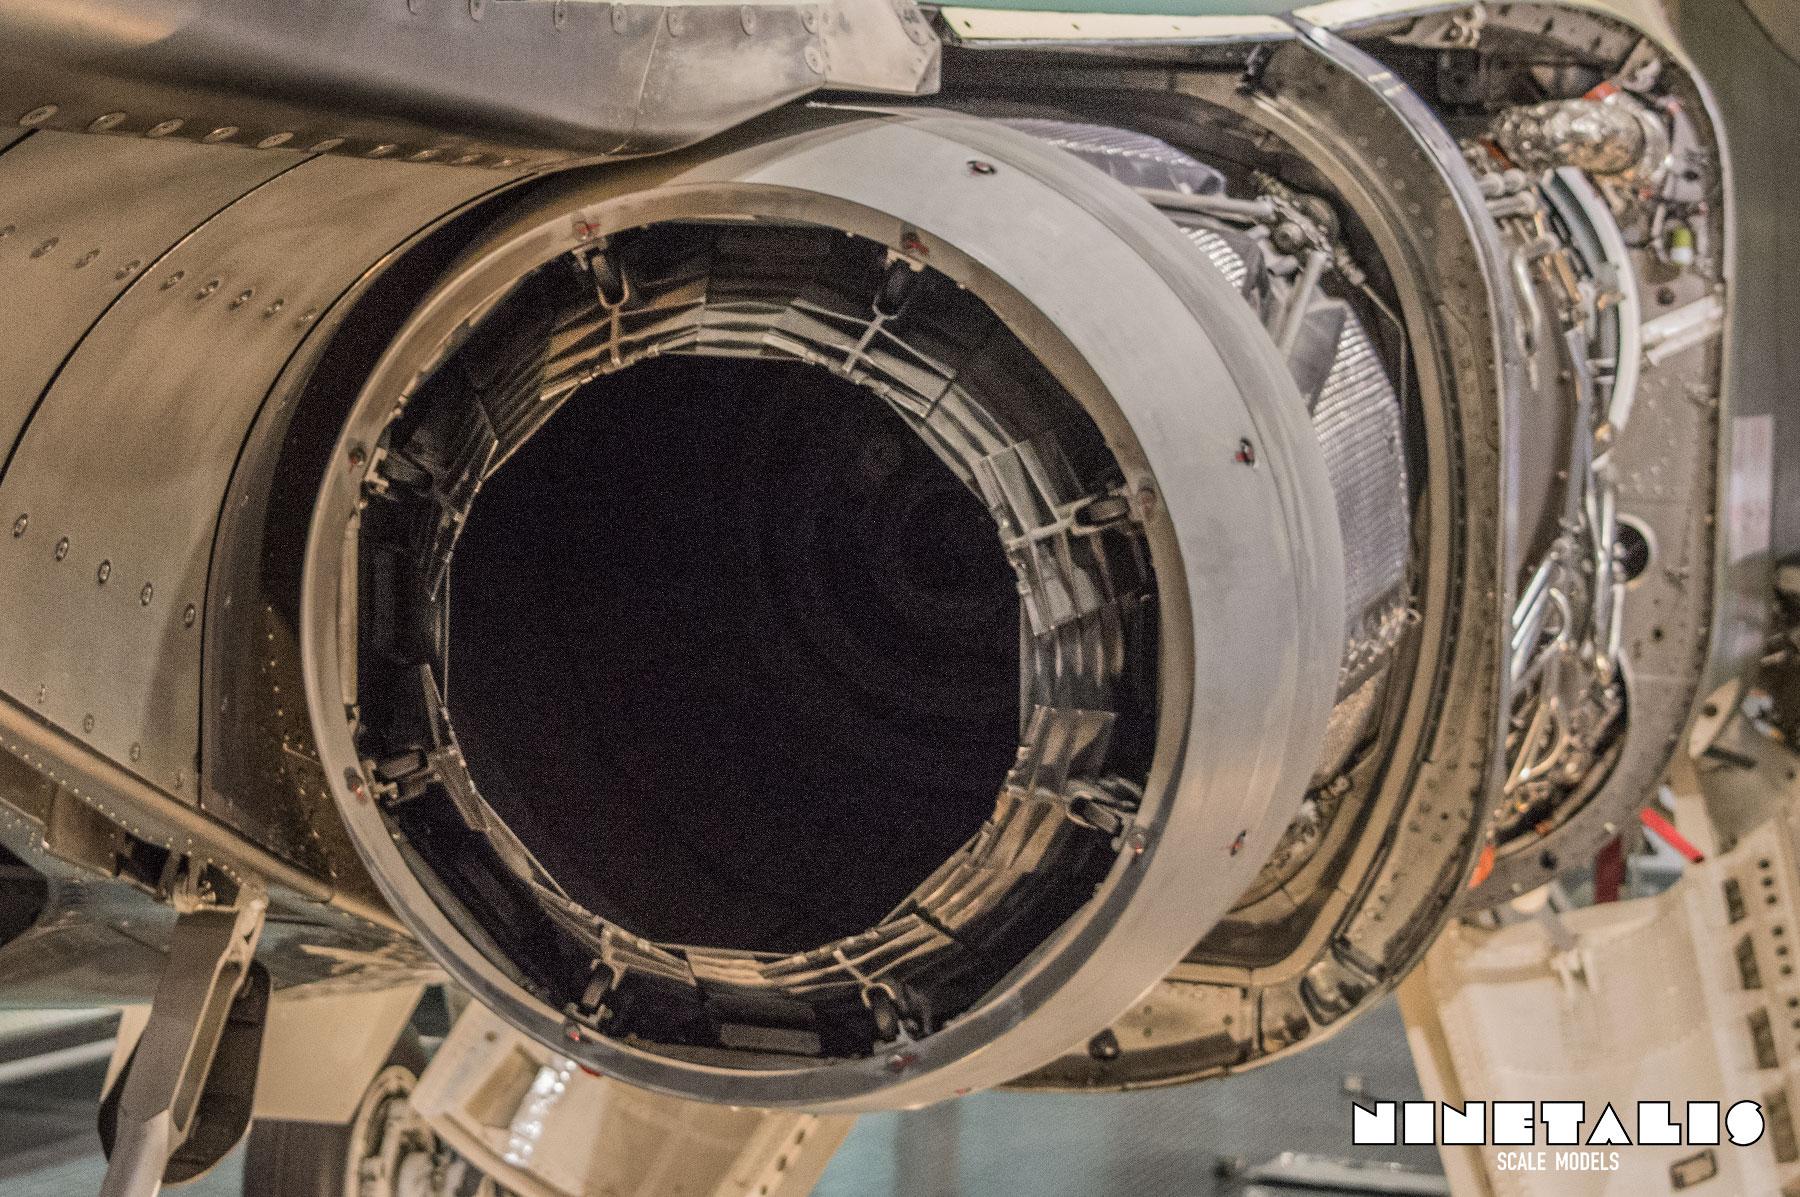 Mitsubishi F1 W Engine6 Ninetalis Scale Models